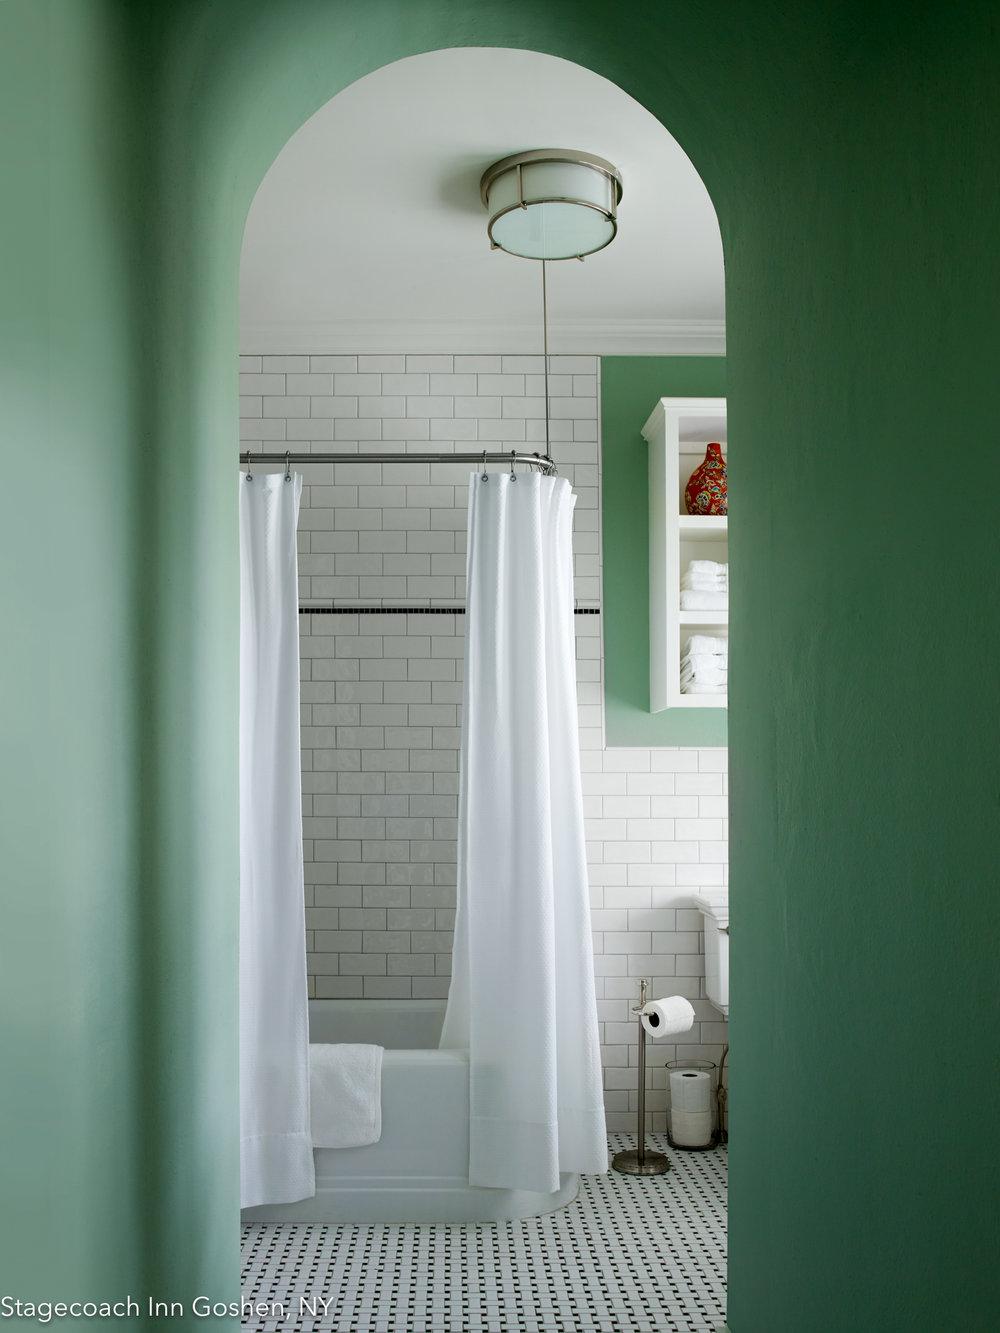 Guggenheim_Bathroom_2.jpg